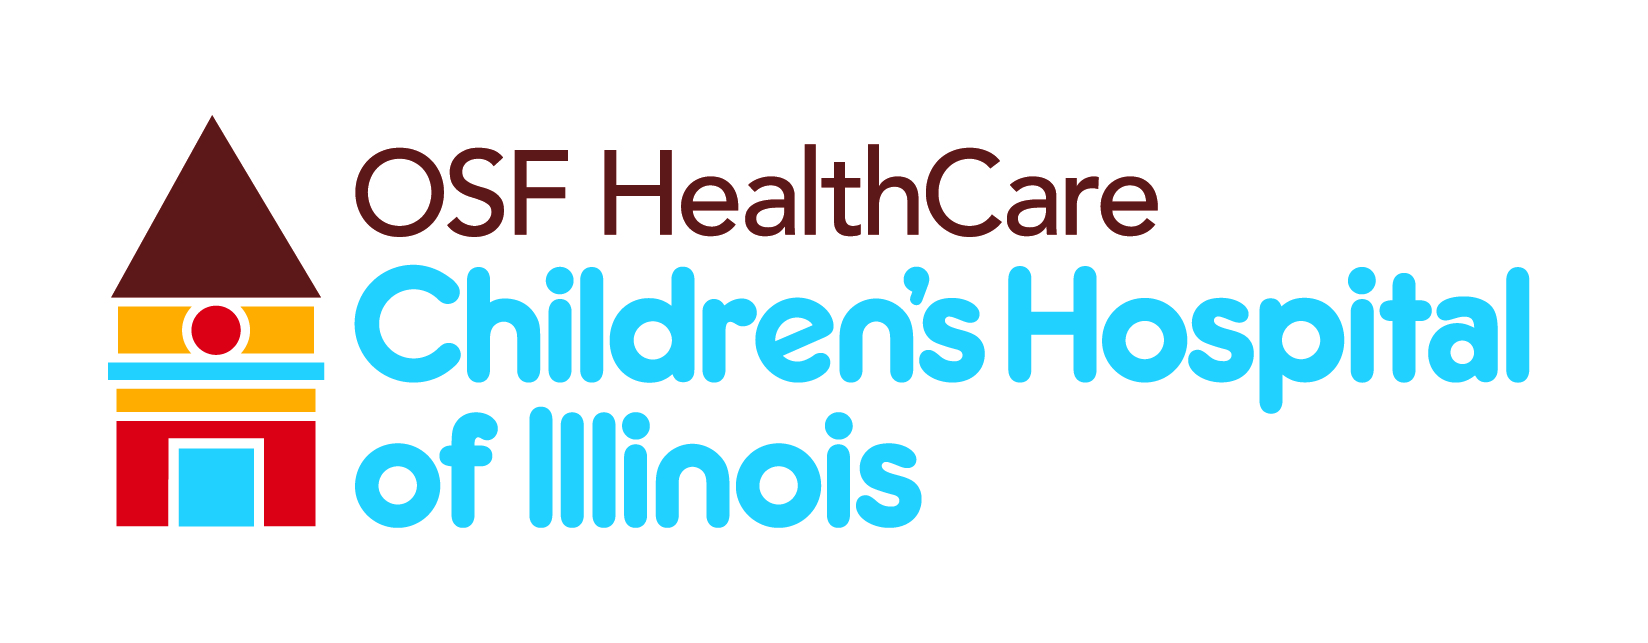 OSFHC Childrens Hospital of IL 2017_1505777208391.jpg